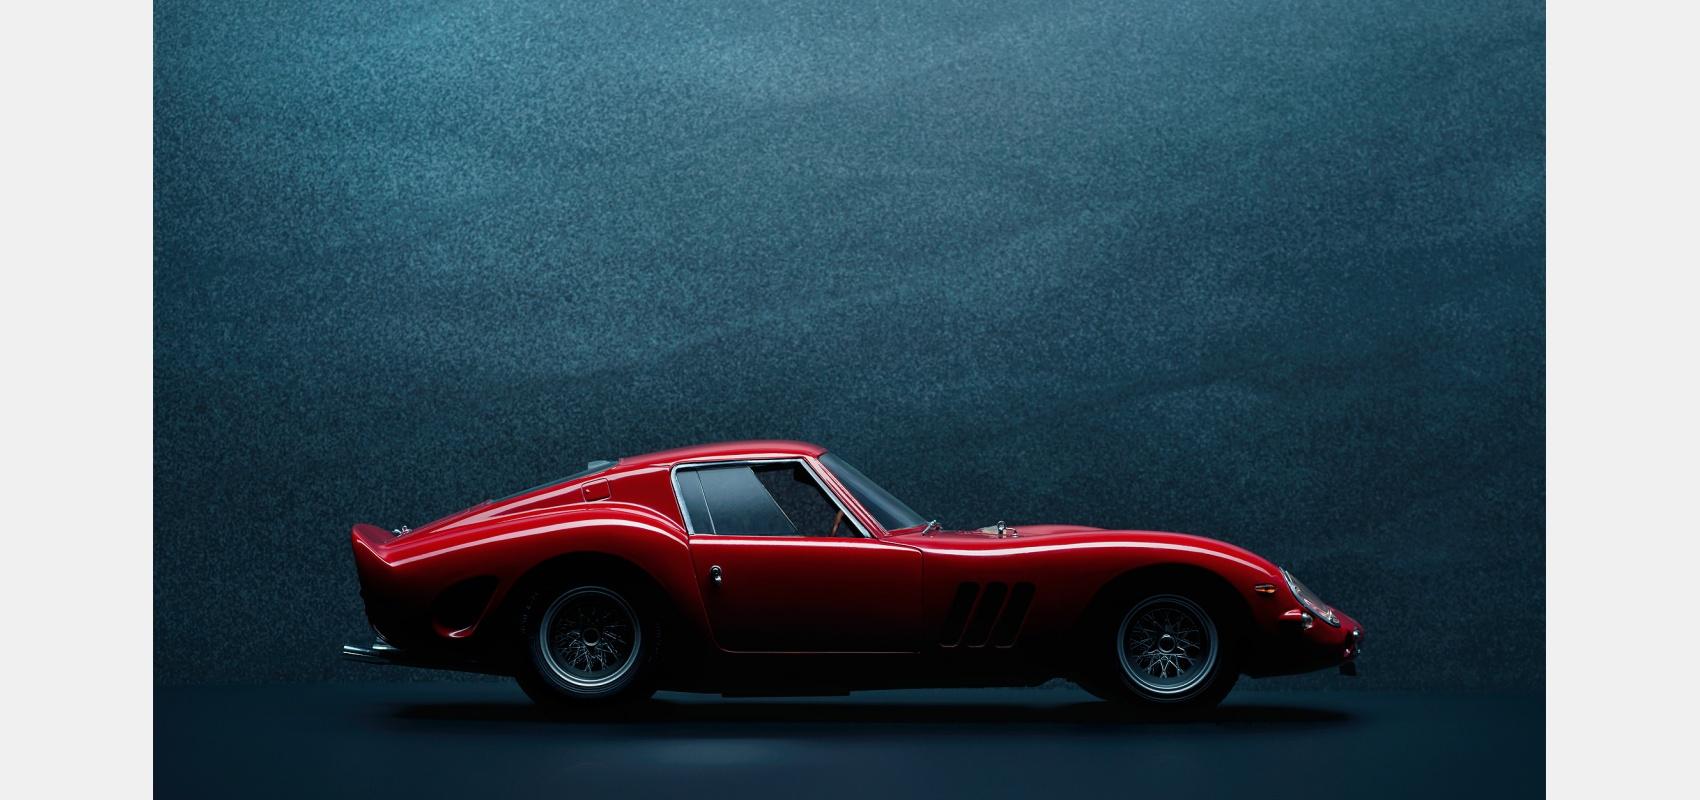 Product photography/Automotive/196/ Red/ Ferrari 250 GTO/ studio profile.